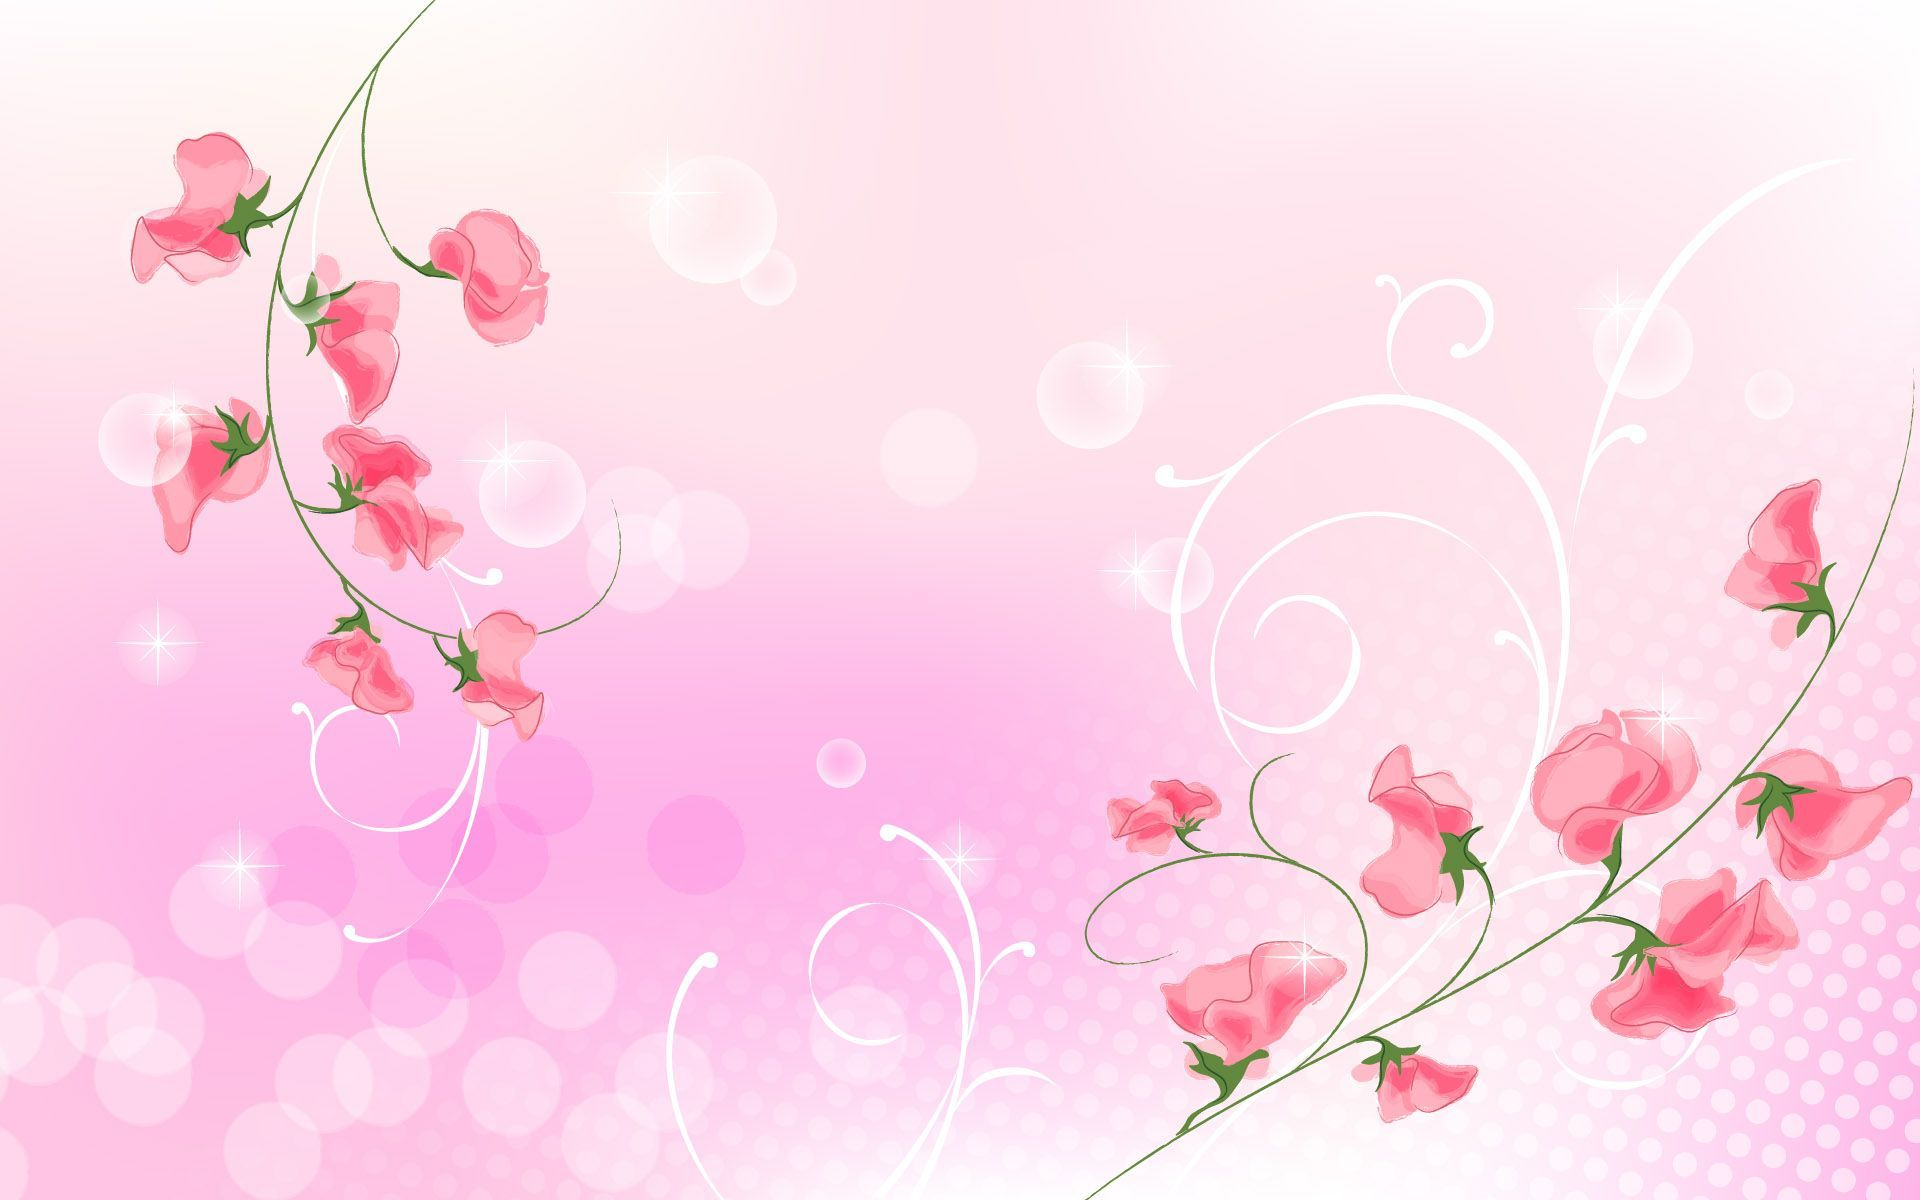 Flower Wallpaper Pink Background Natures Wallpapers Pinterest